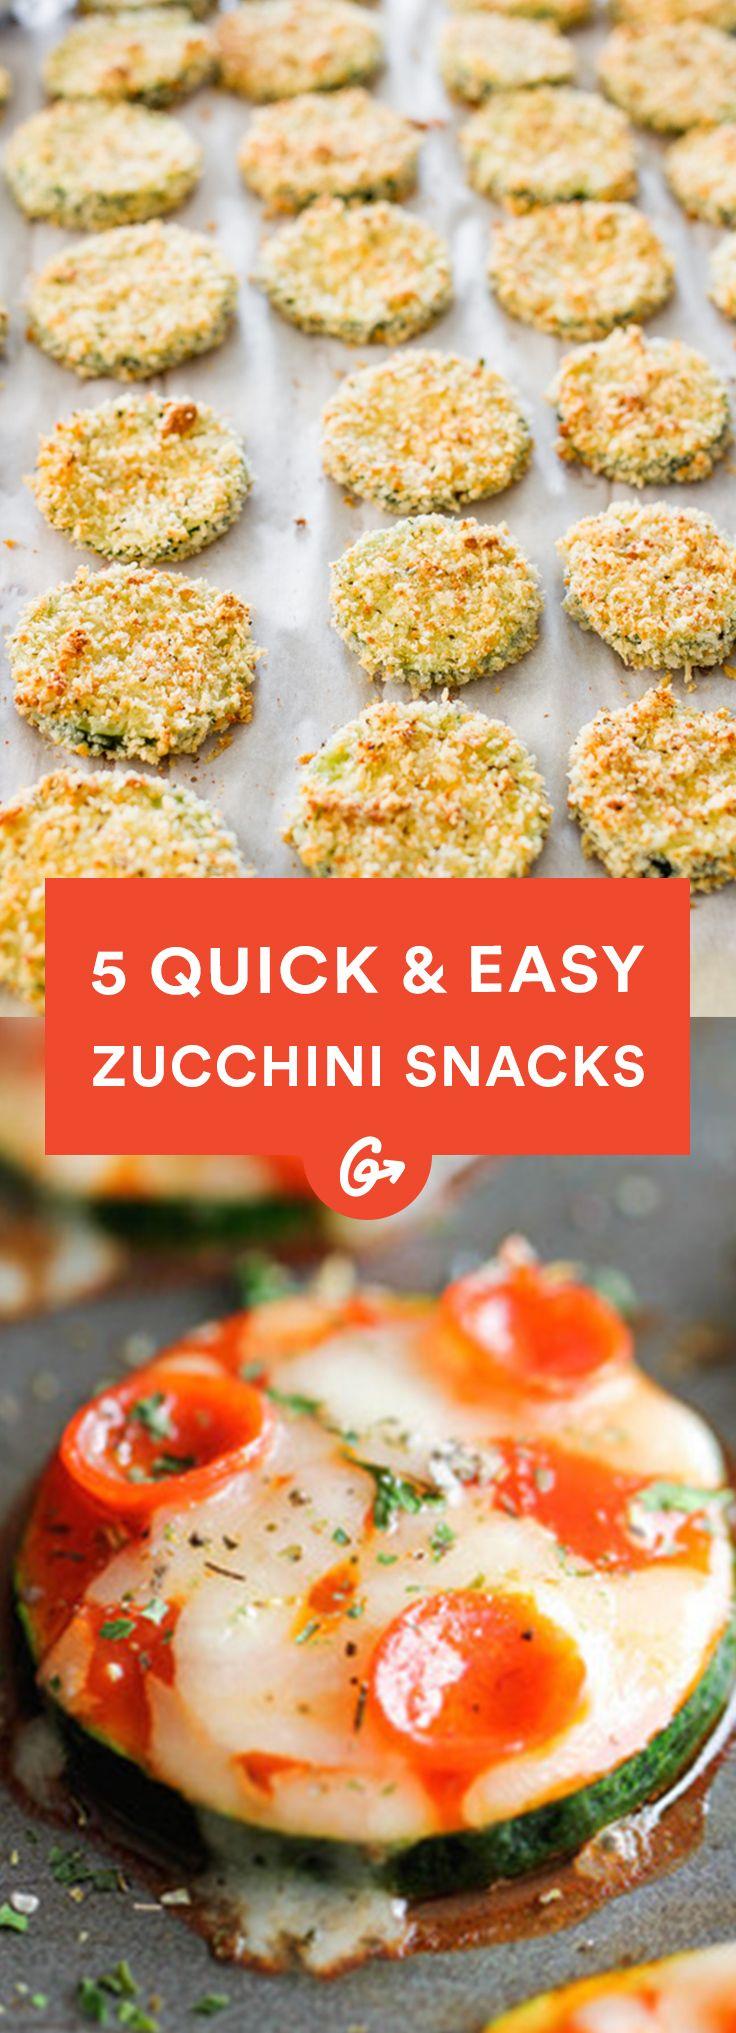 What are some quick zucchini recipes?